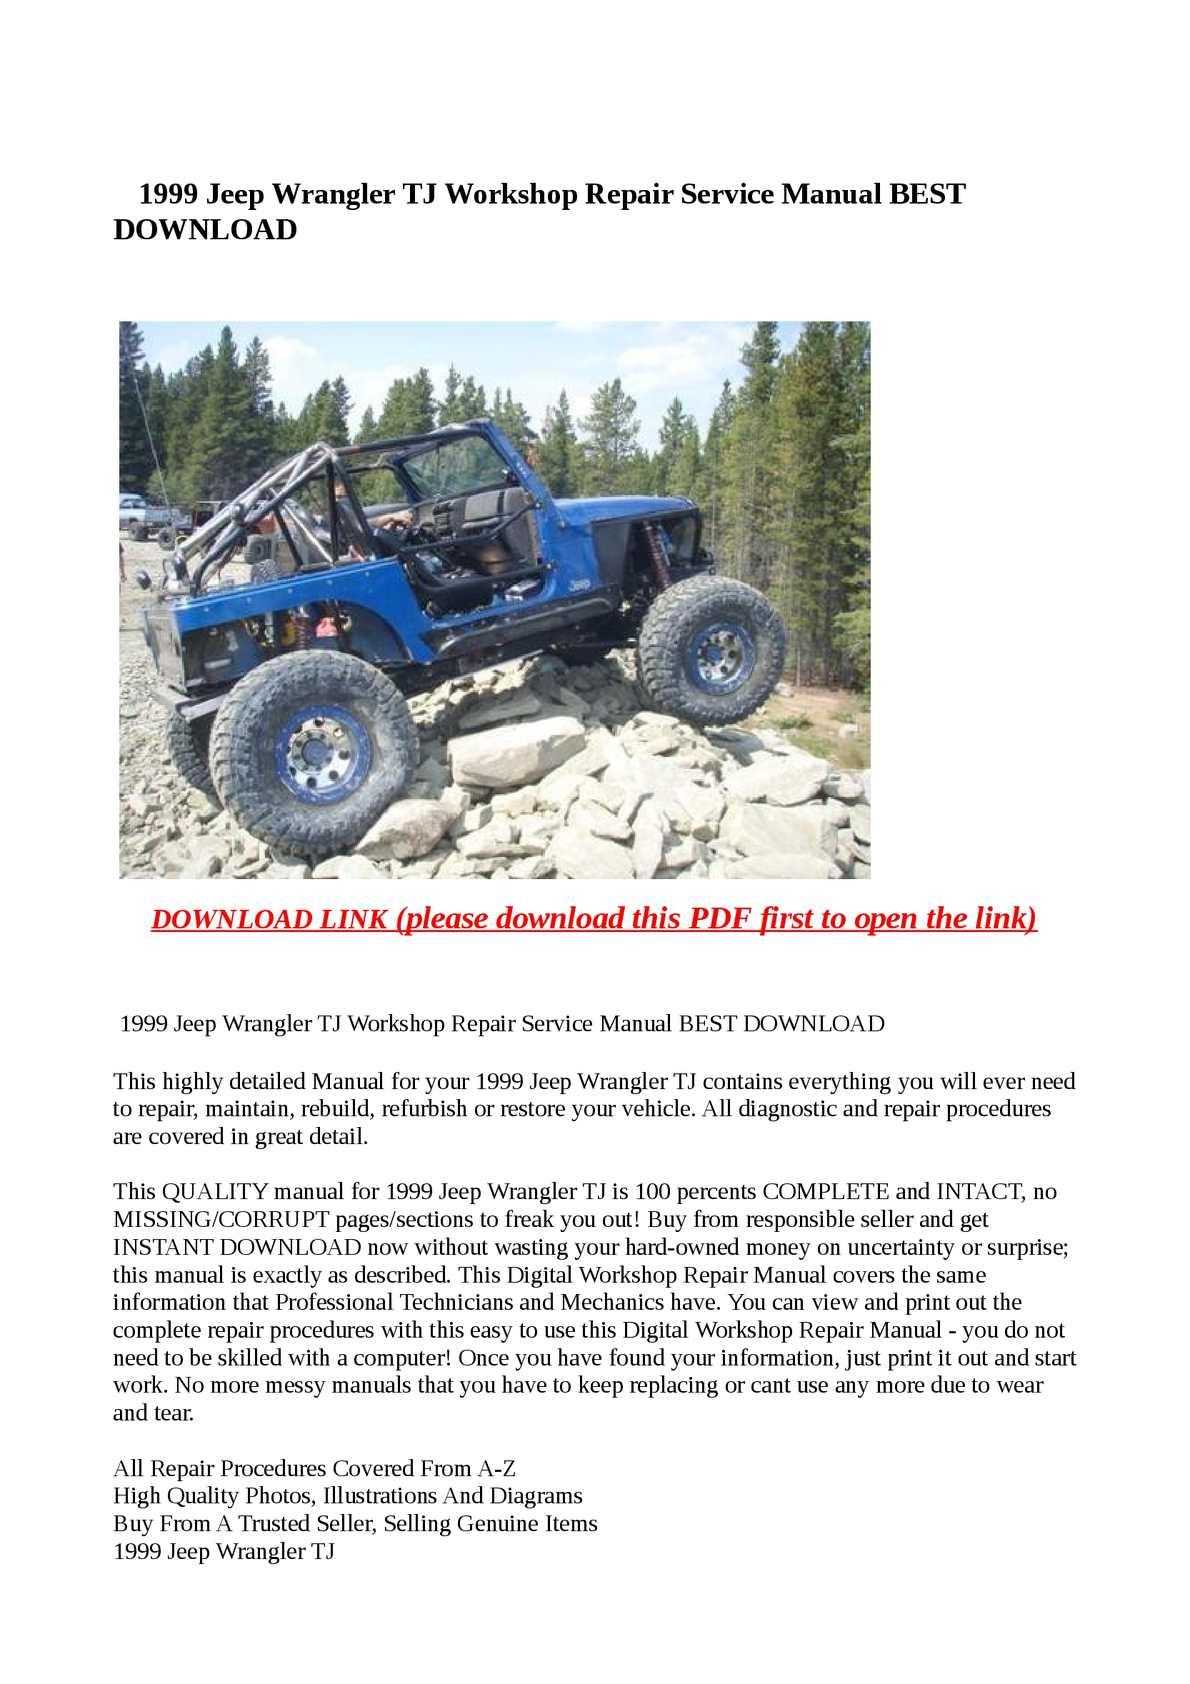 Calaméo - 1999 Jeep Wrangler TJ Workshop Repair Service Manual BEST DOWNLOAD